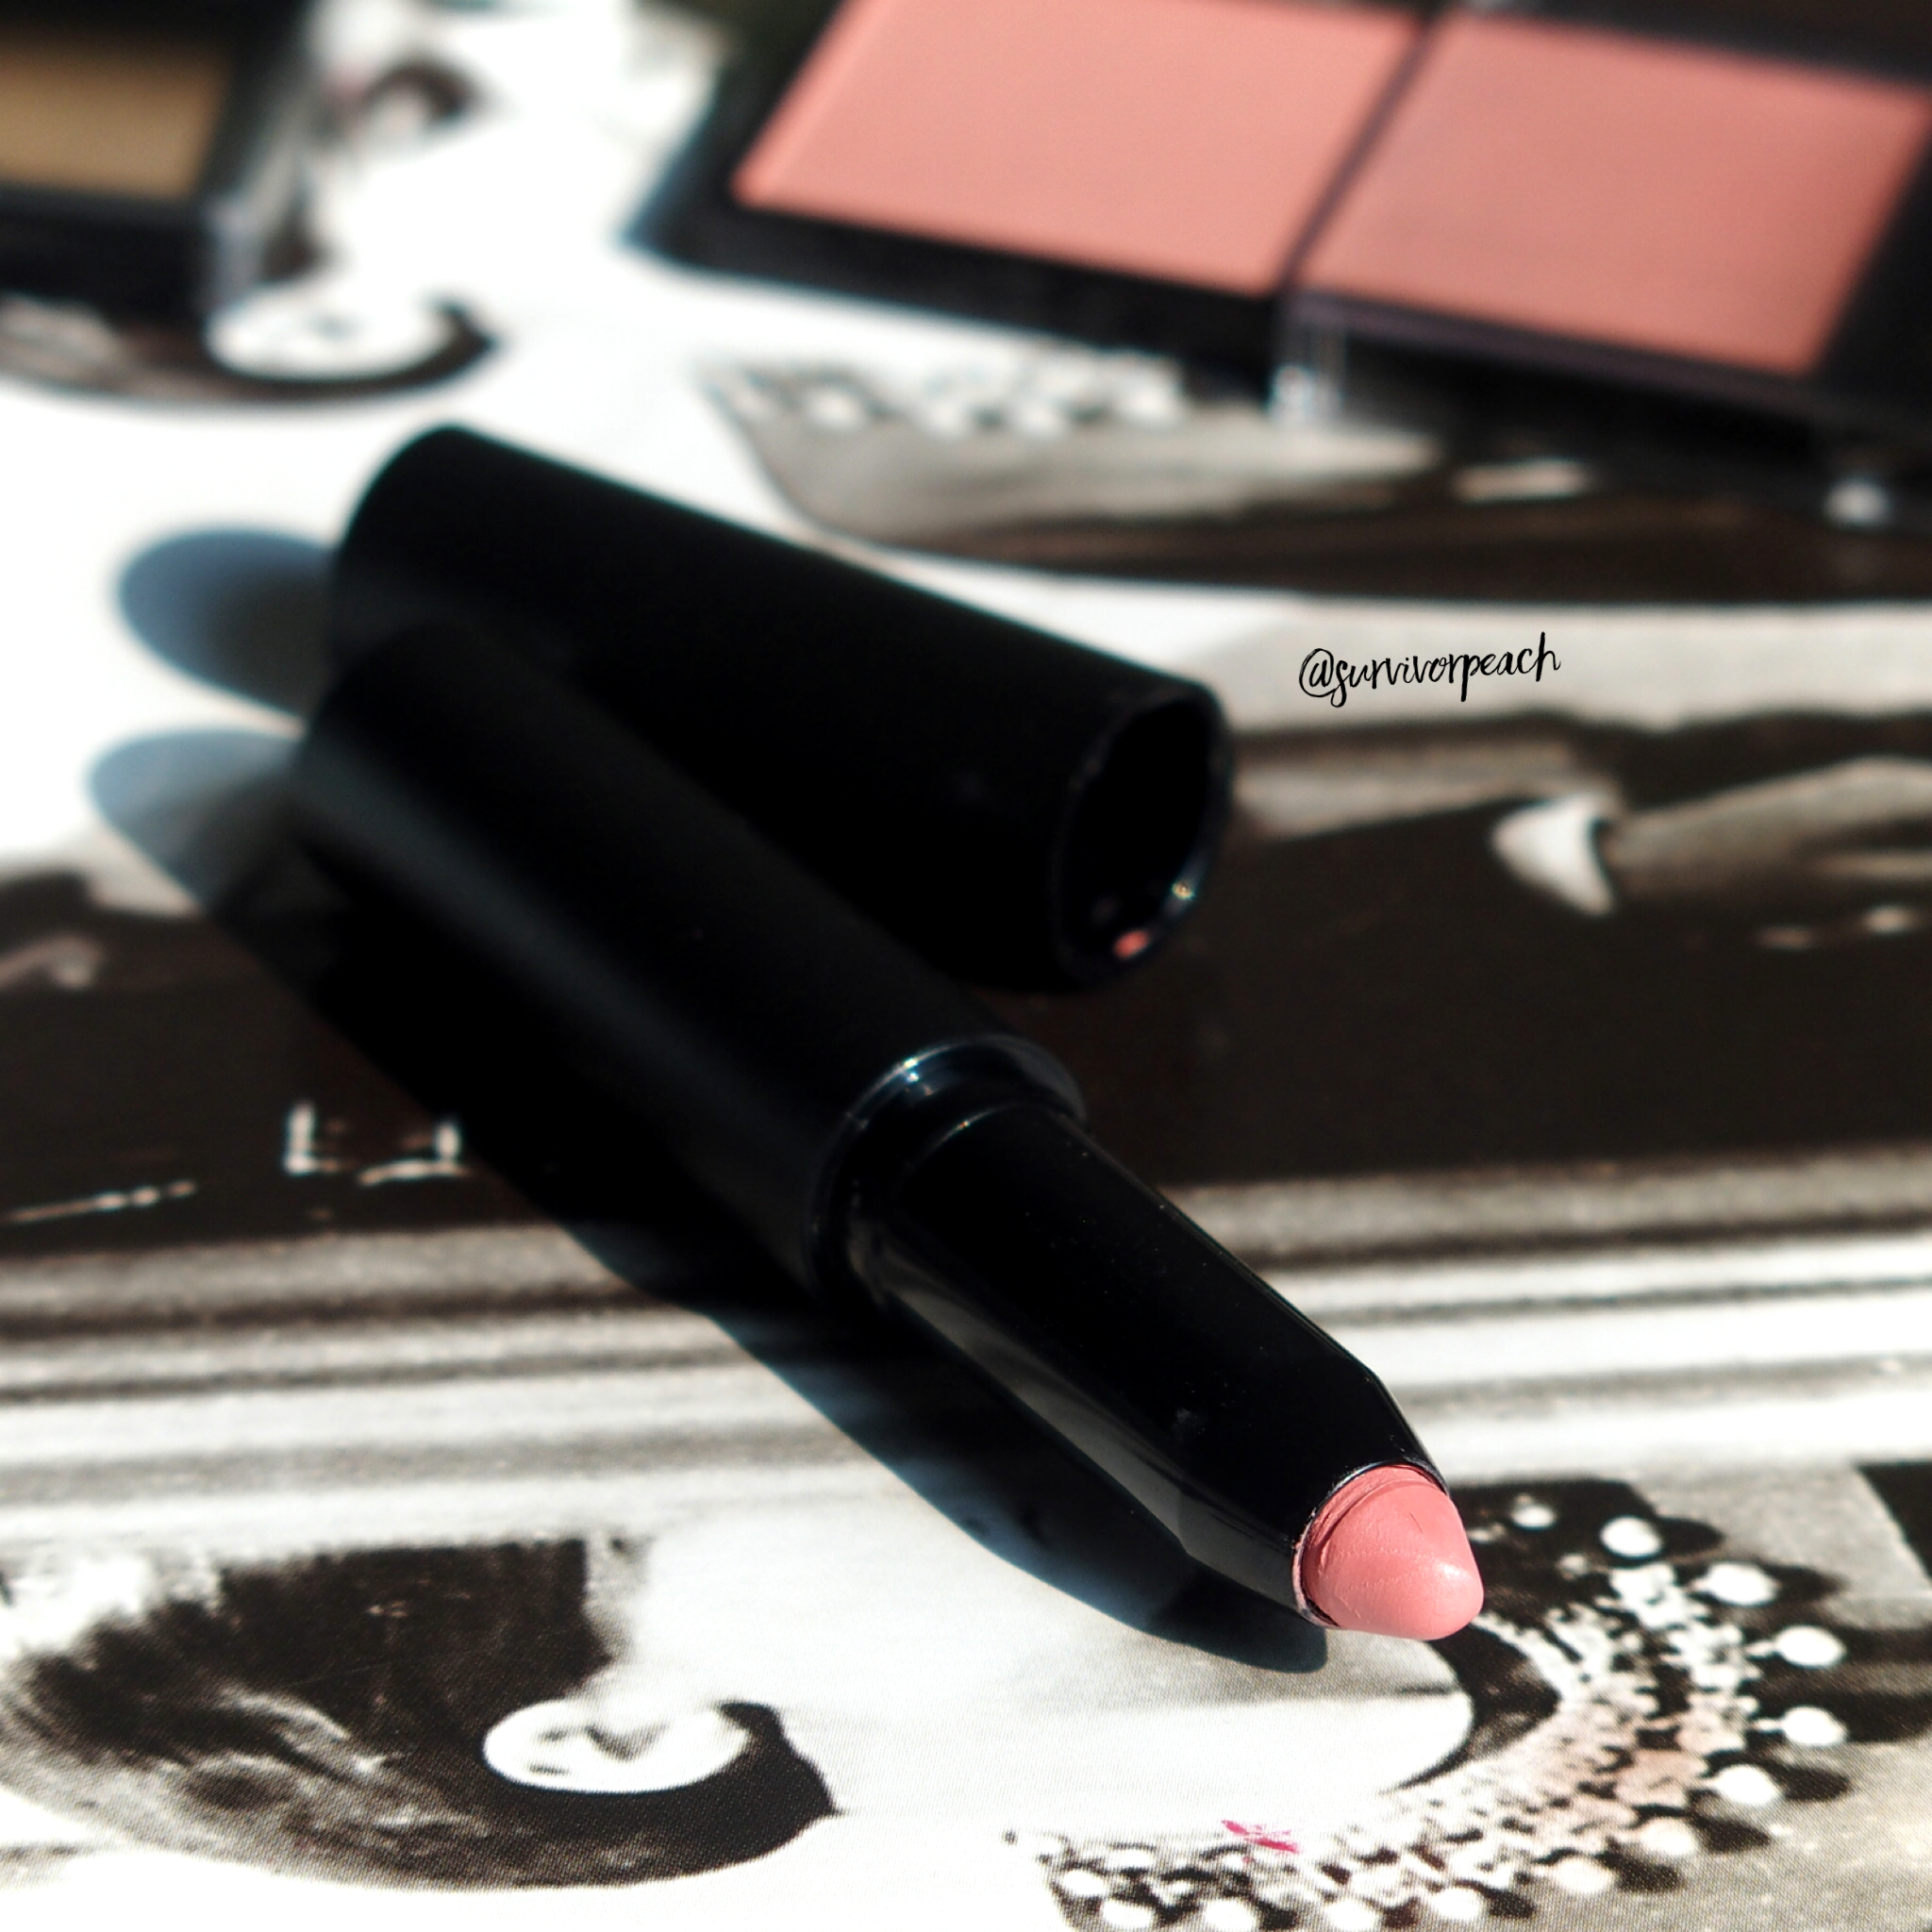 Surratt Automatique Lip Crayon in shade Gentillesse